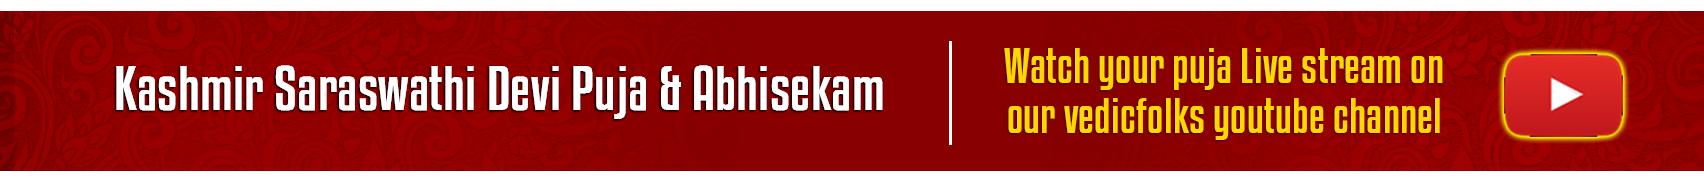 Kashmir Saraswathi Puja Youtube link